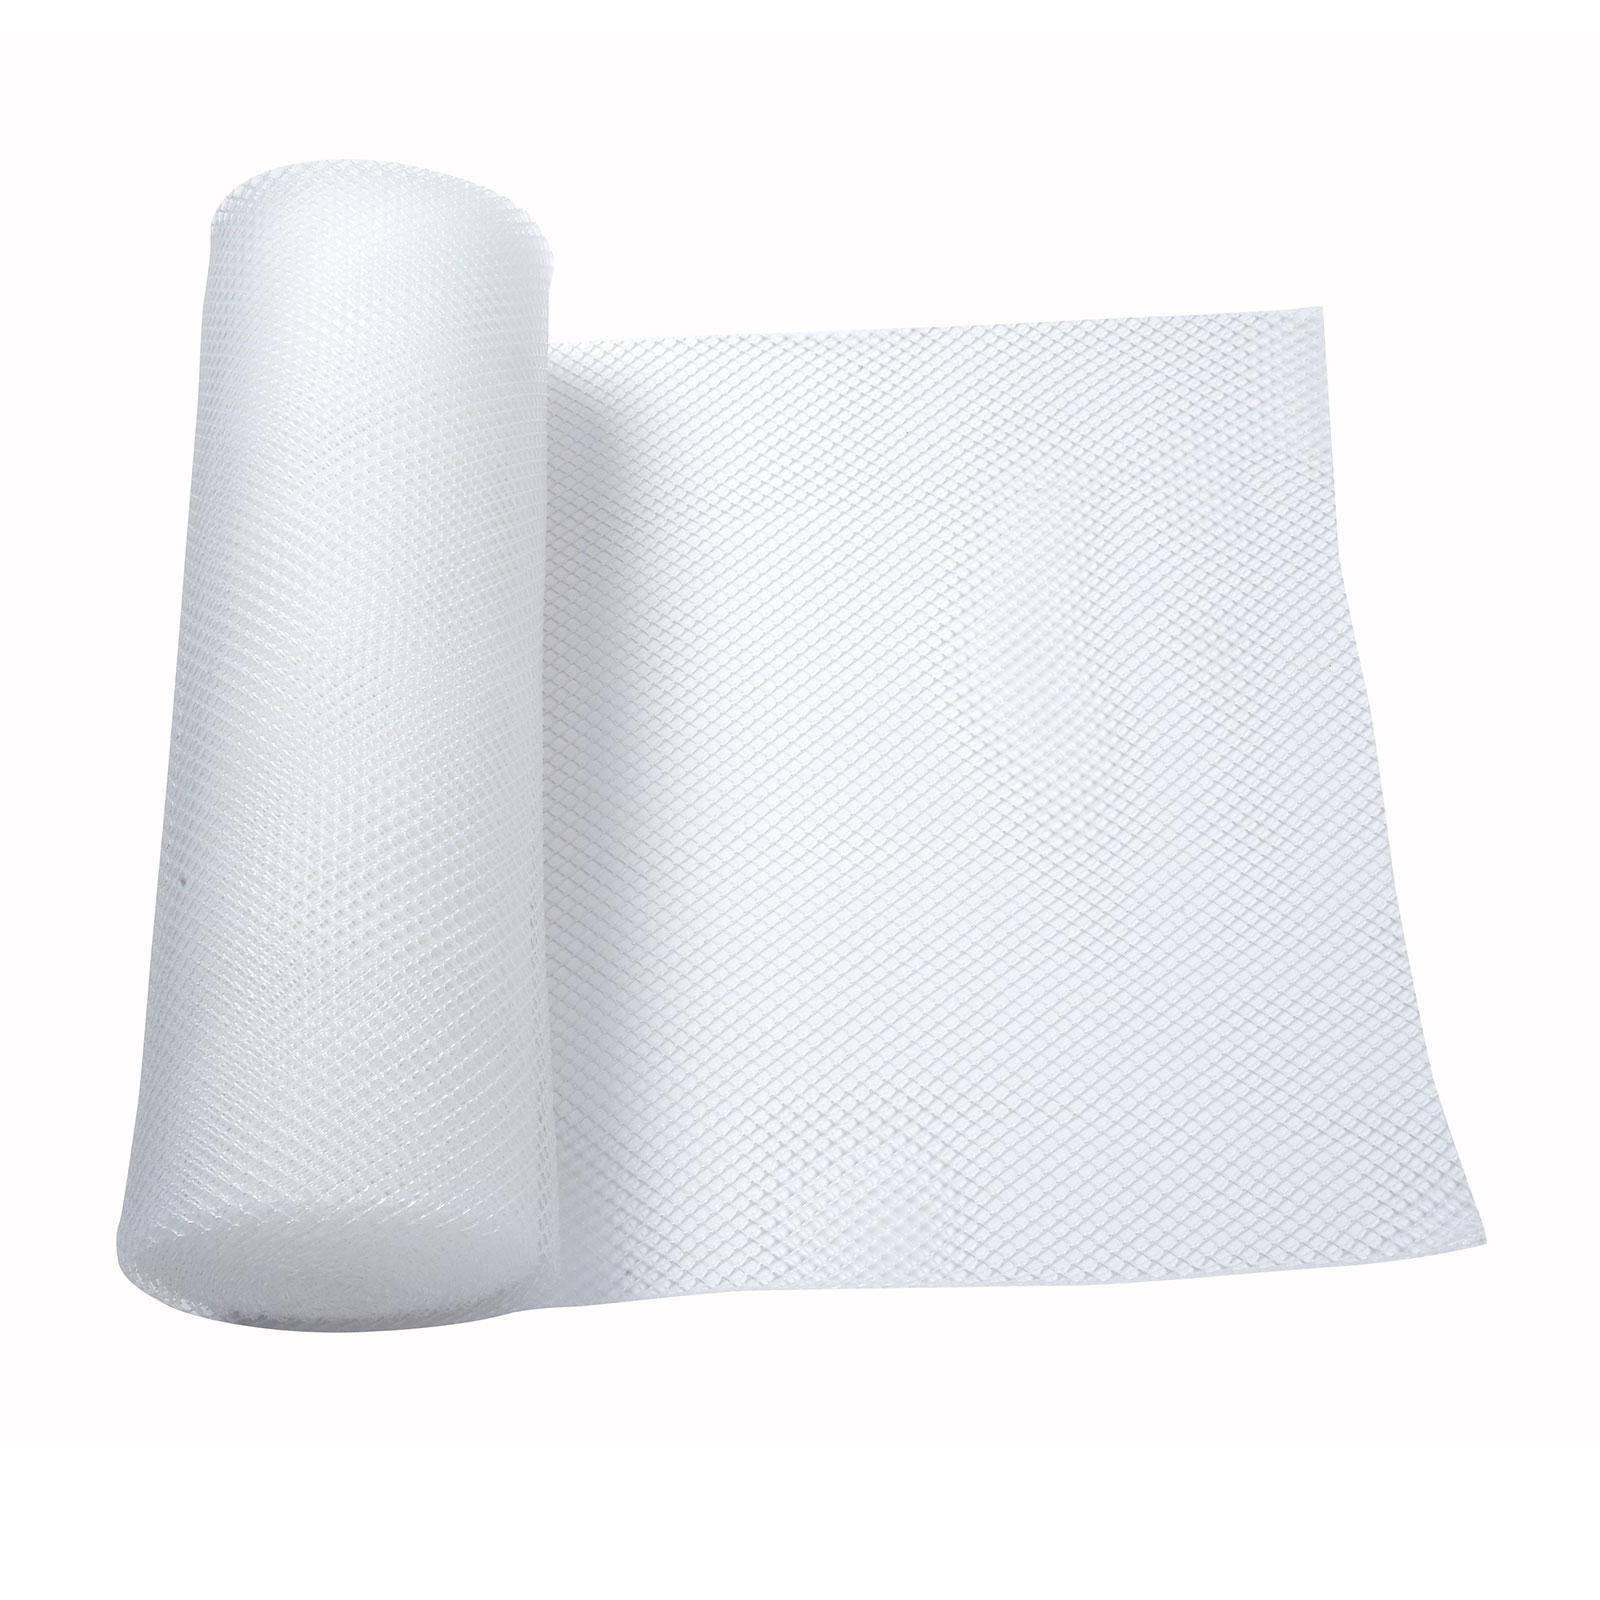 3102-14 Winco BL-240C bar & shelf liner, roll